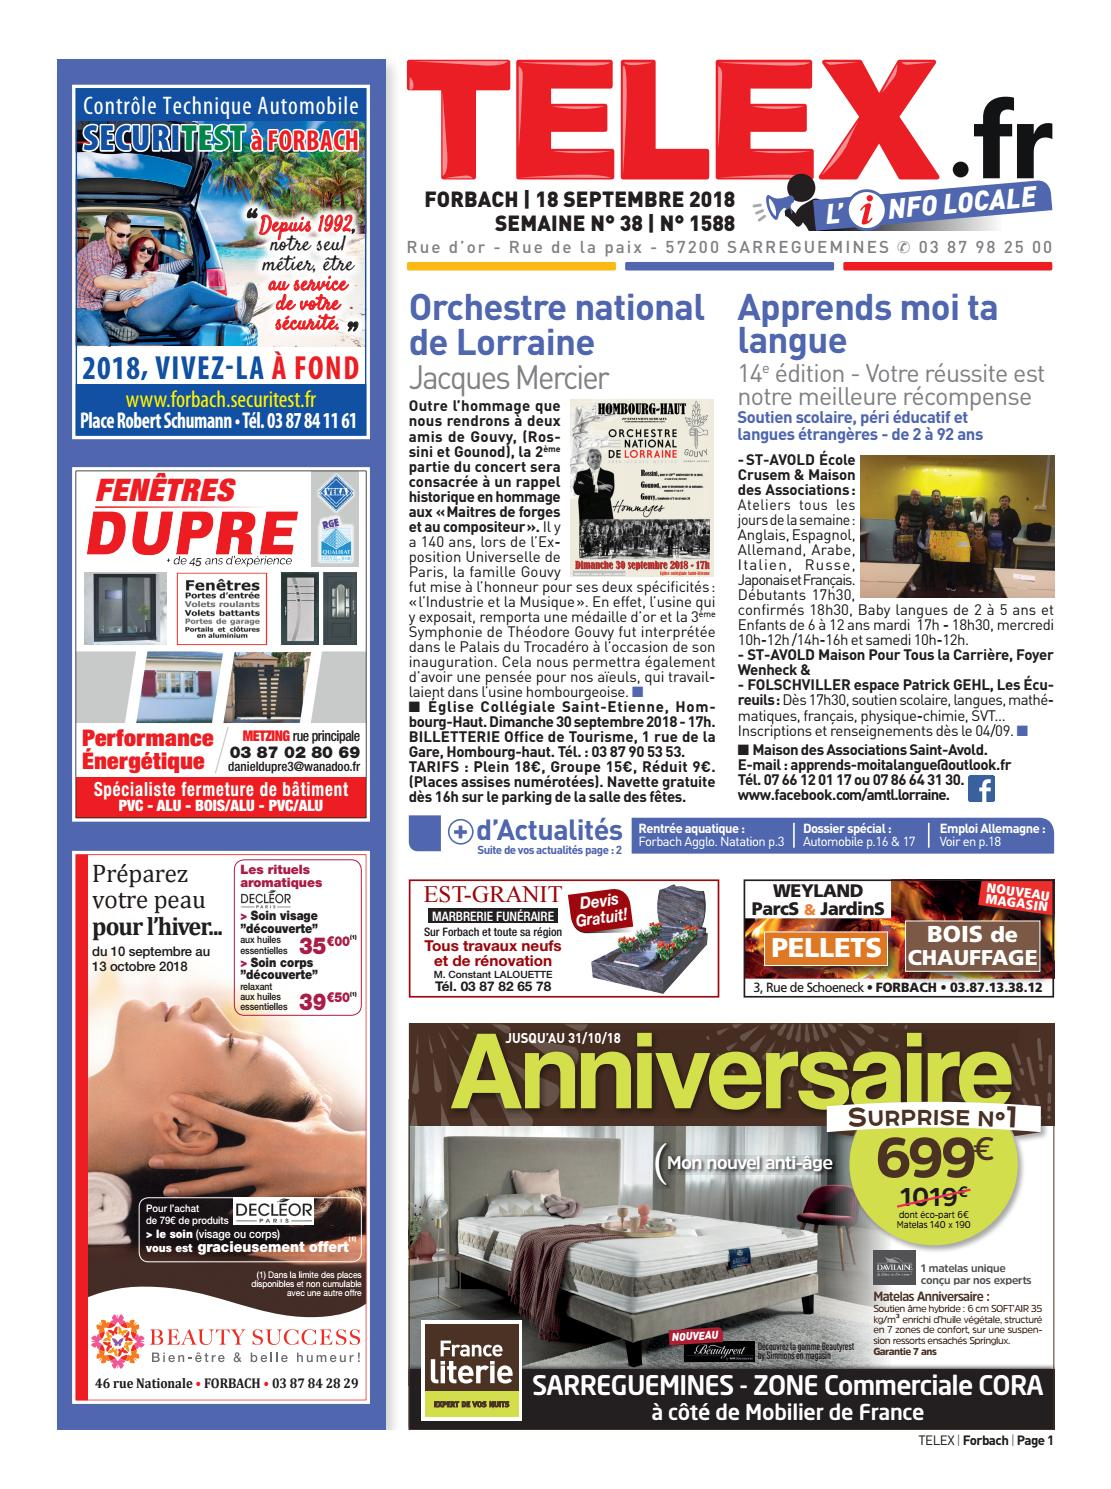 Thermomix 3300 Le Bon Coin 3818 forbachclaude vervin - issuu